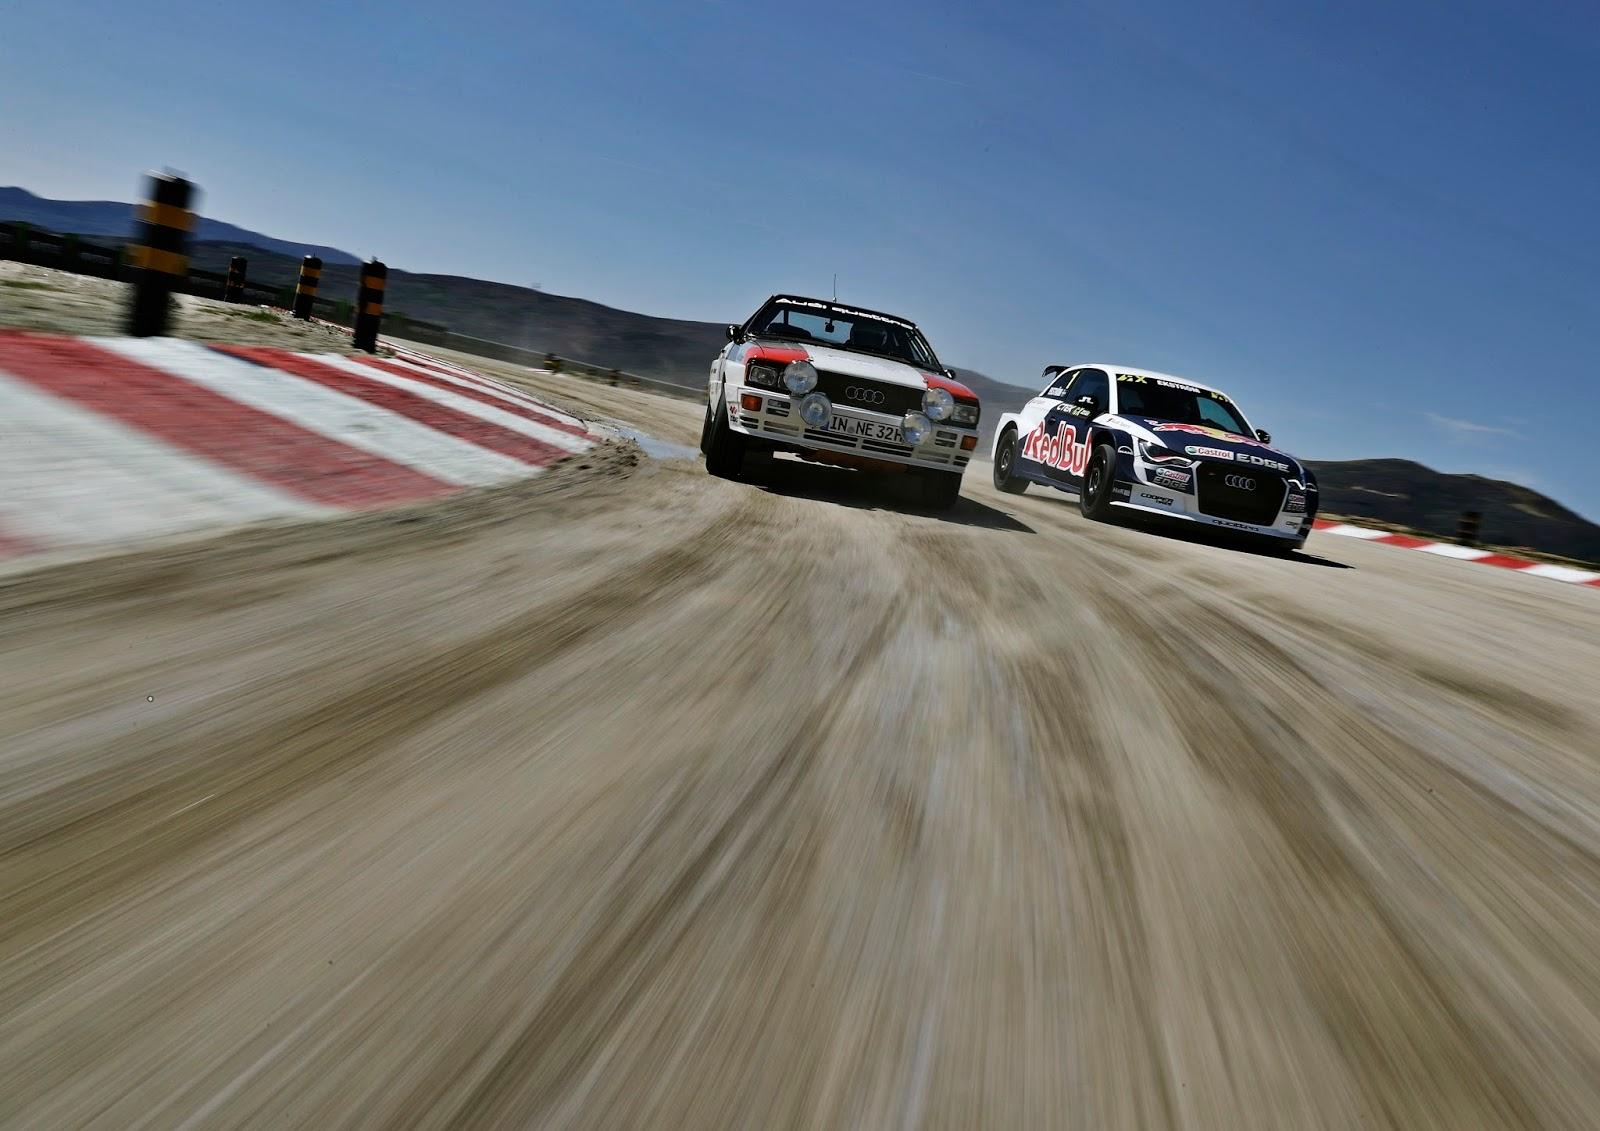 A173289 large 1 Δες όλο τον αγώνα του συναρπαστικού Rallycross FIA, FIA World Rallycross Championship, Rally, videos, World RX